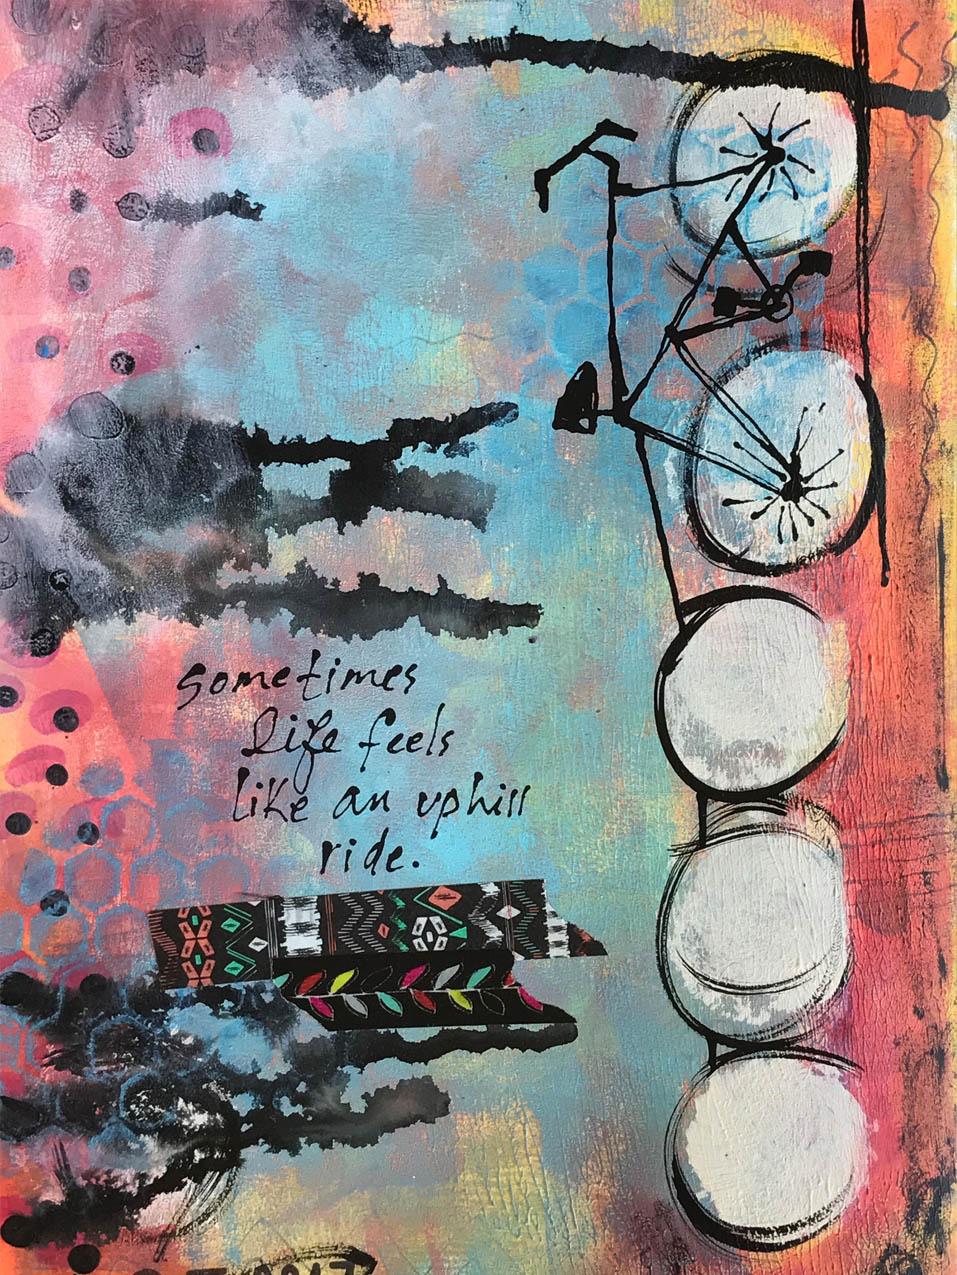 artwork by Syda Howery